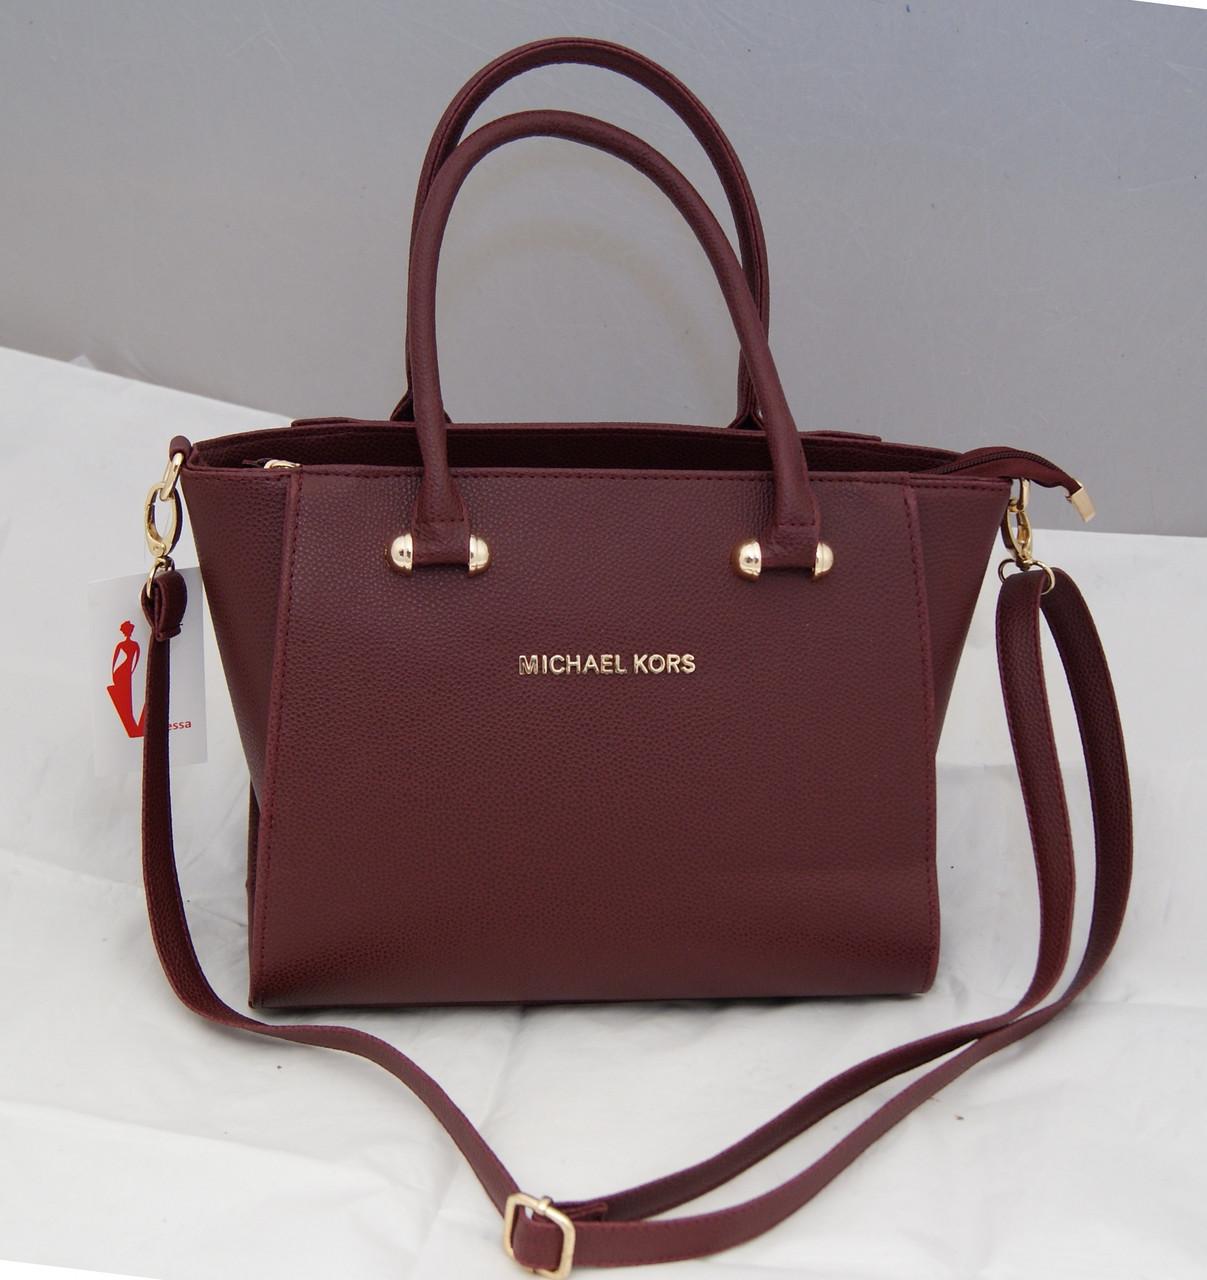 Женская сумка Michael Kors, цвет бордовый Майкл Корс MK